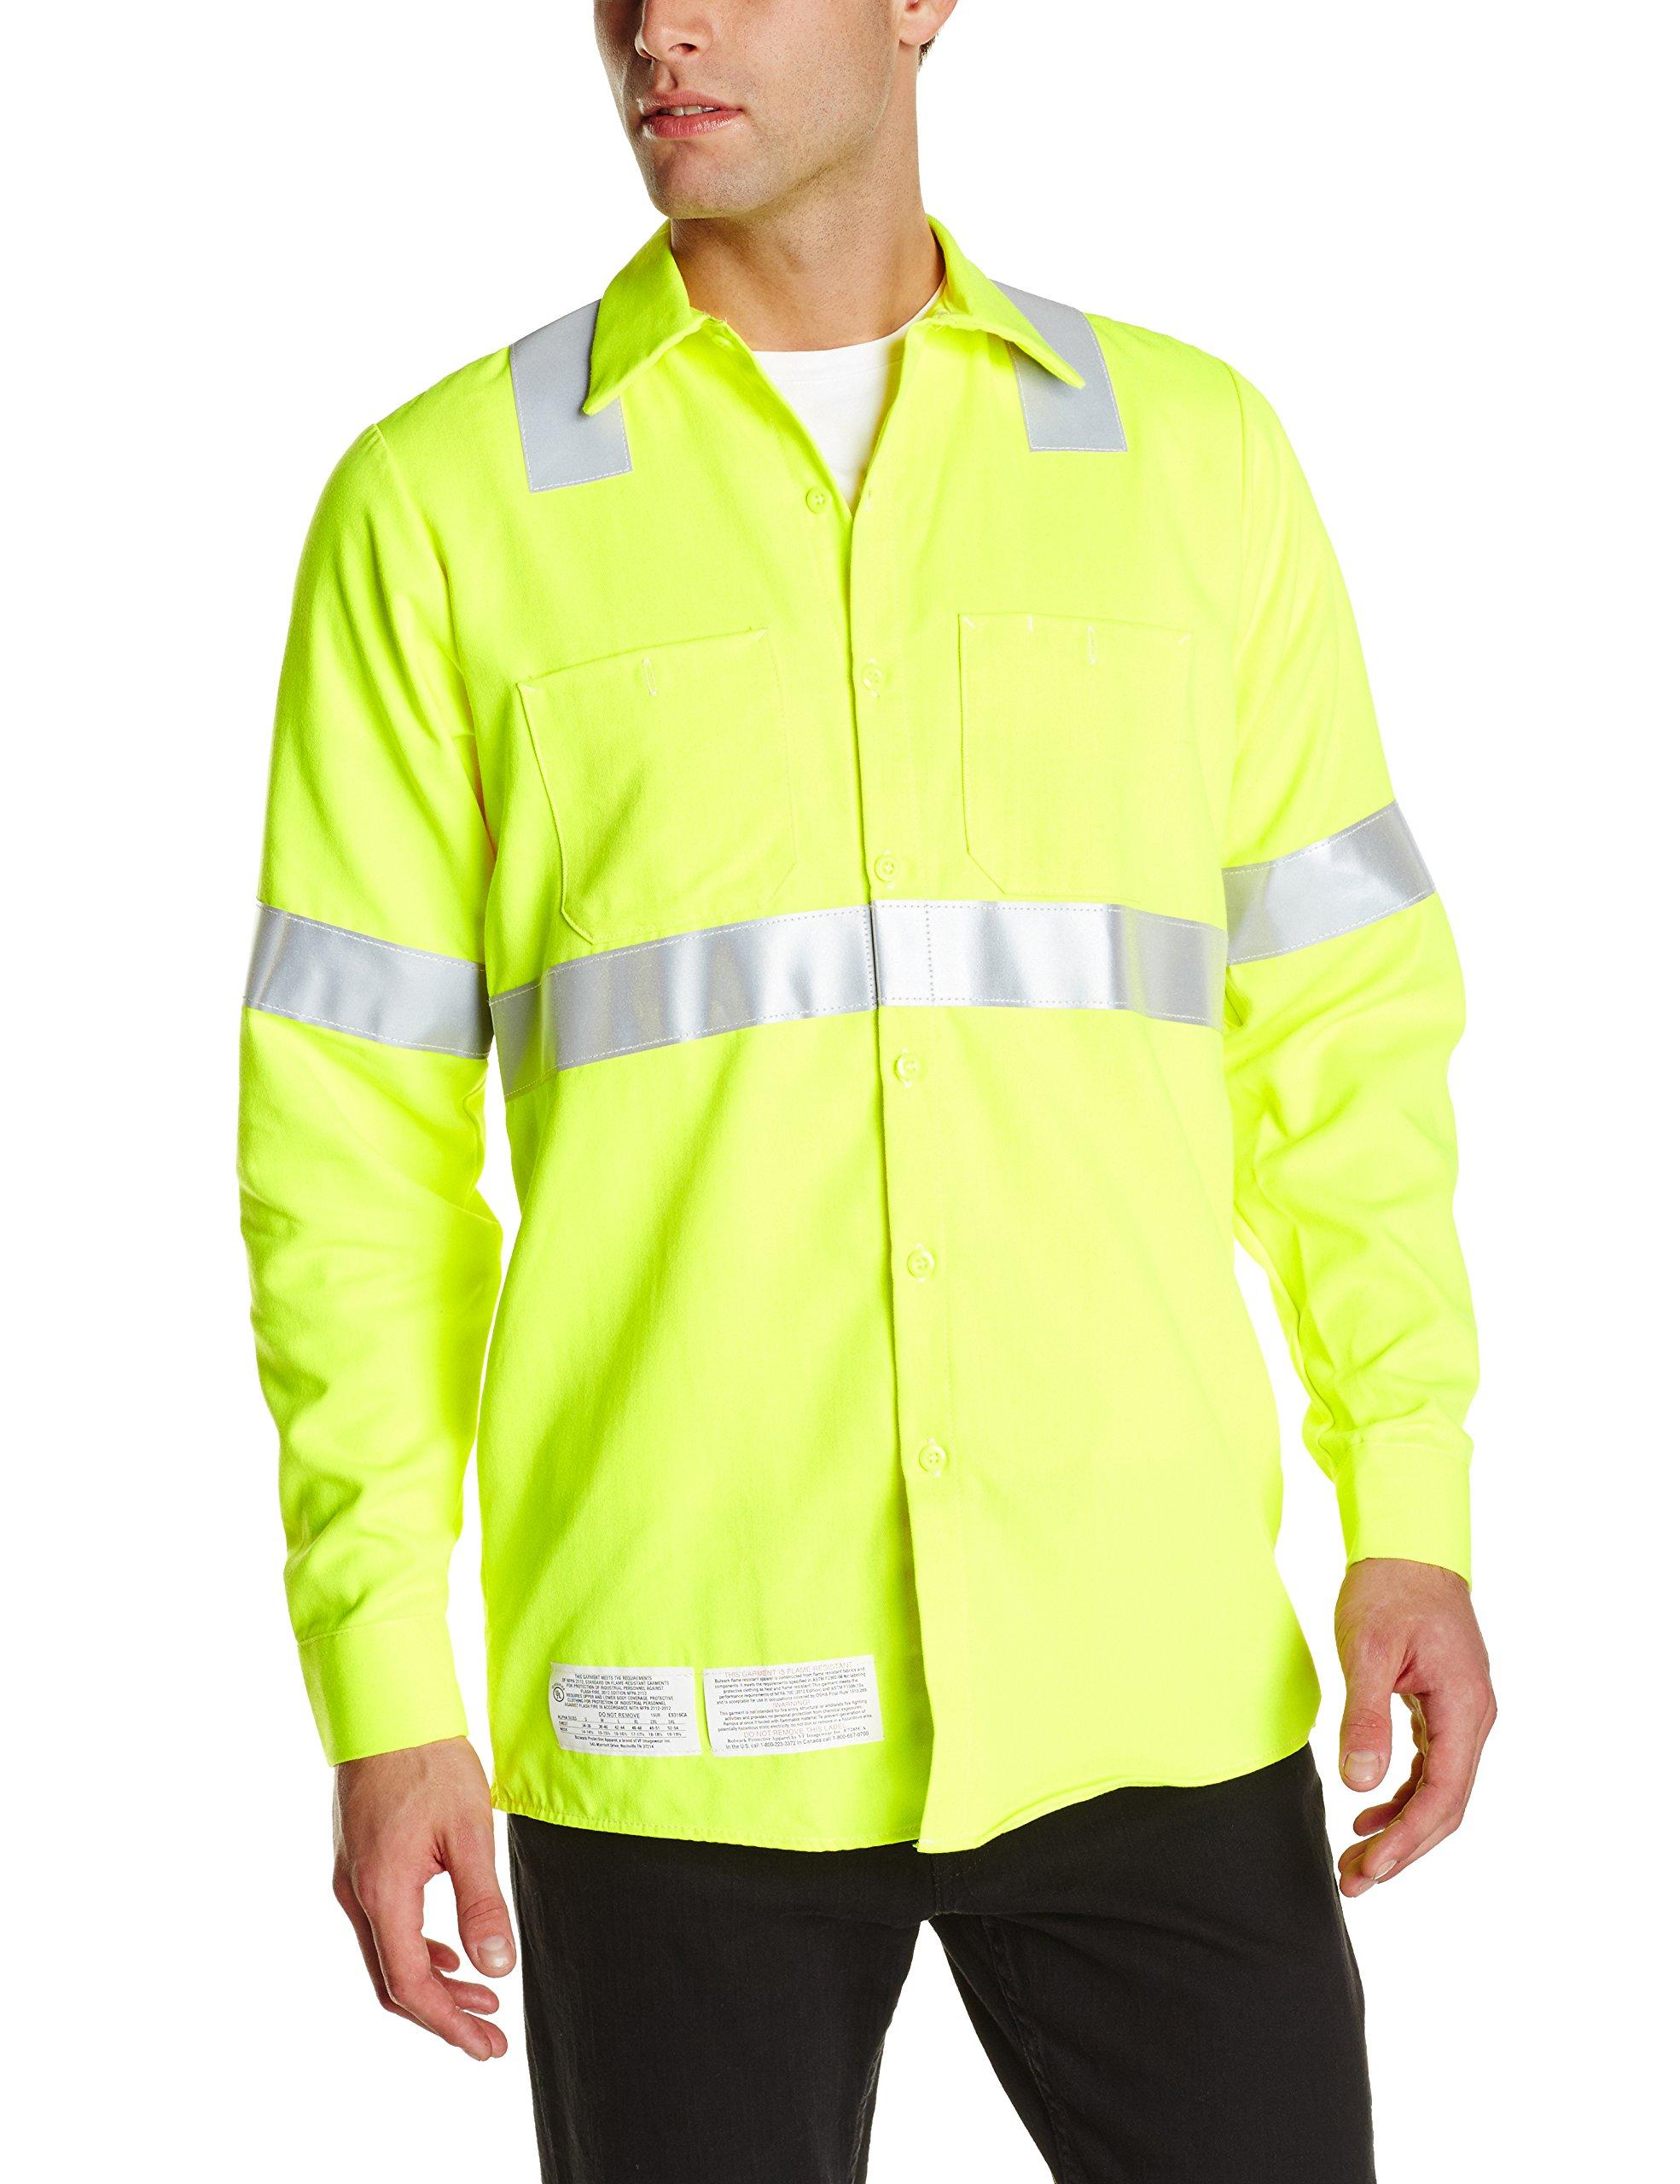 Bulwark Flame Resistant 7 oz Hi-Visibility Work Shirt, Yellow/Green, Large Long